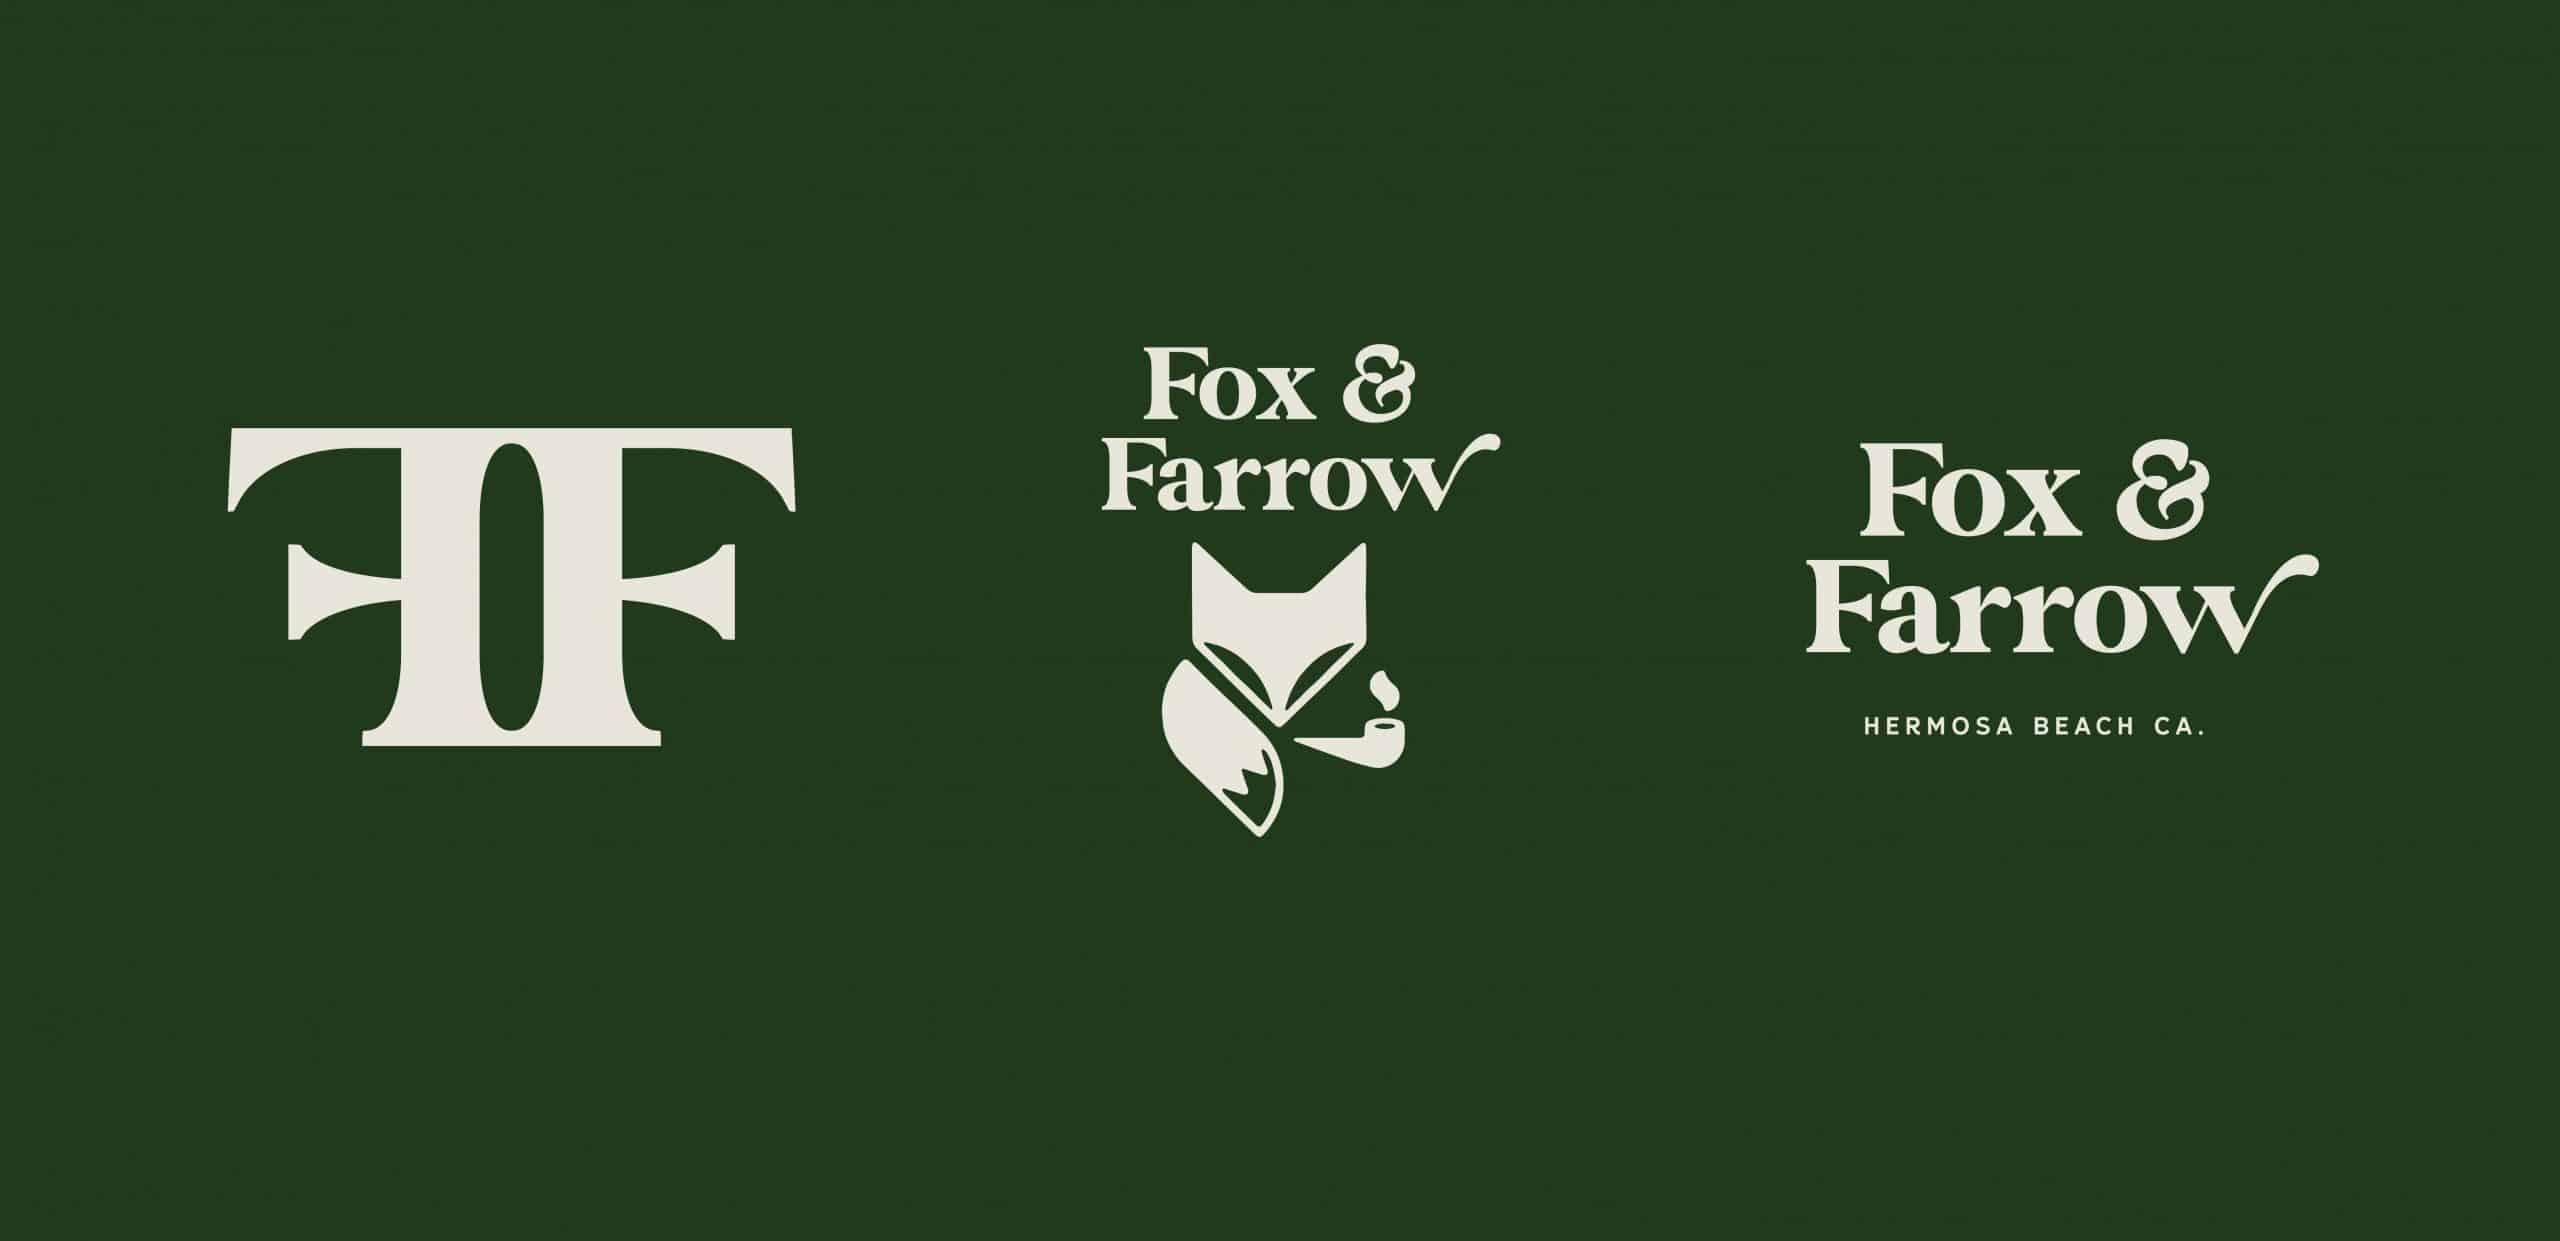 Stellen_Design_Fox_Farrow_Resturant_Branding_Logo_Design-09